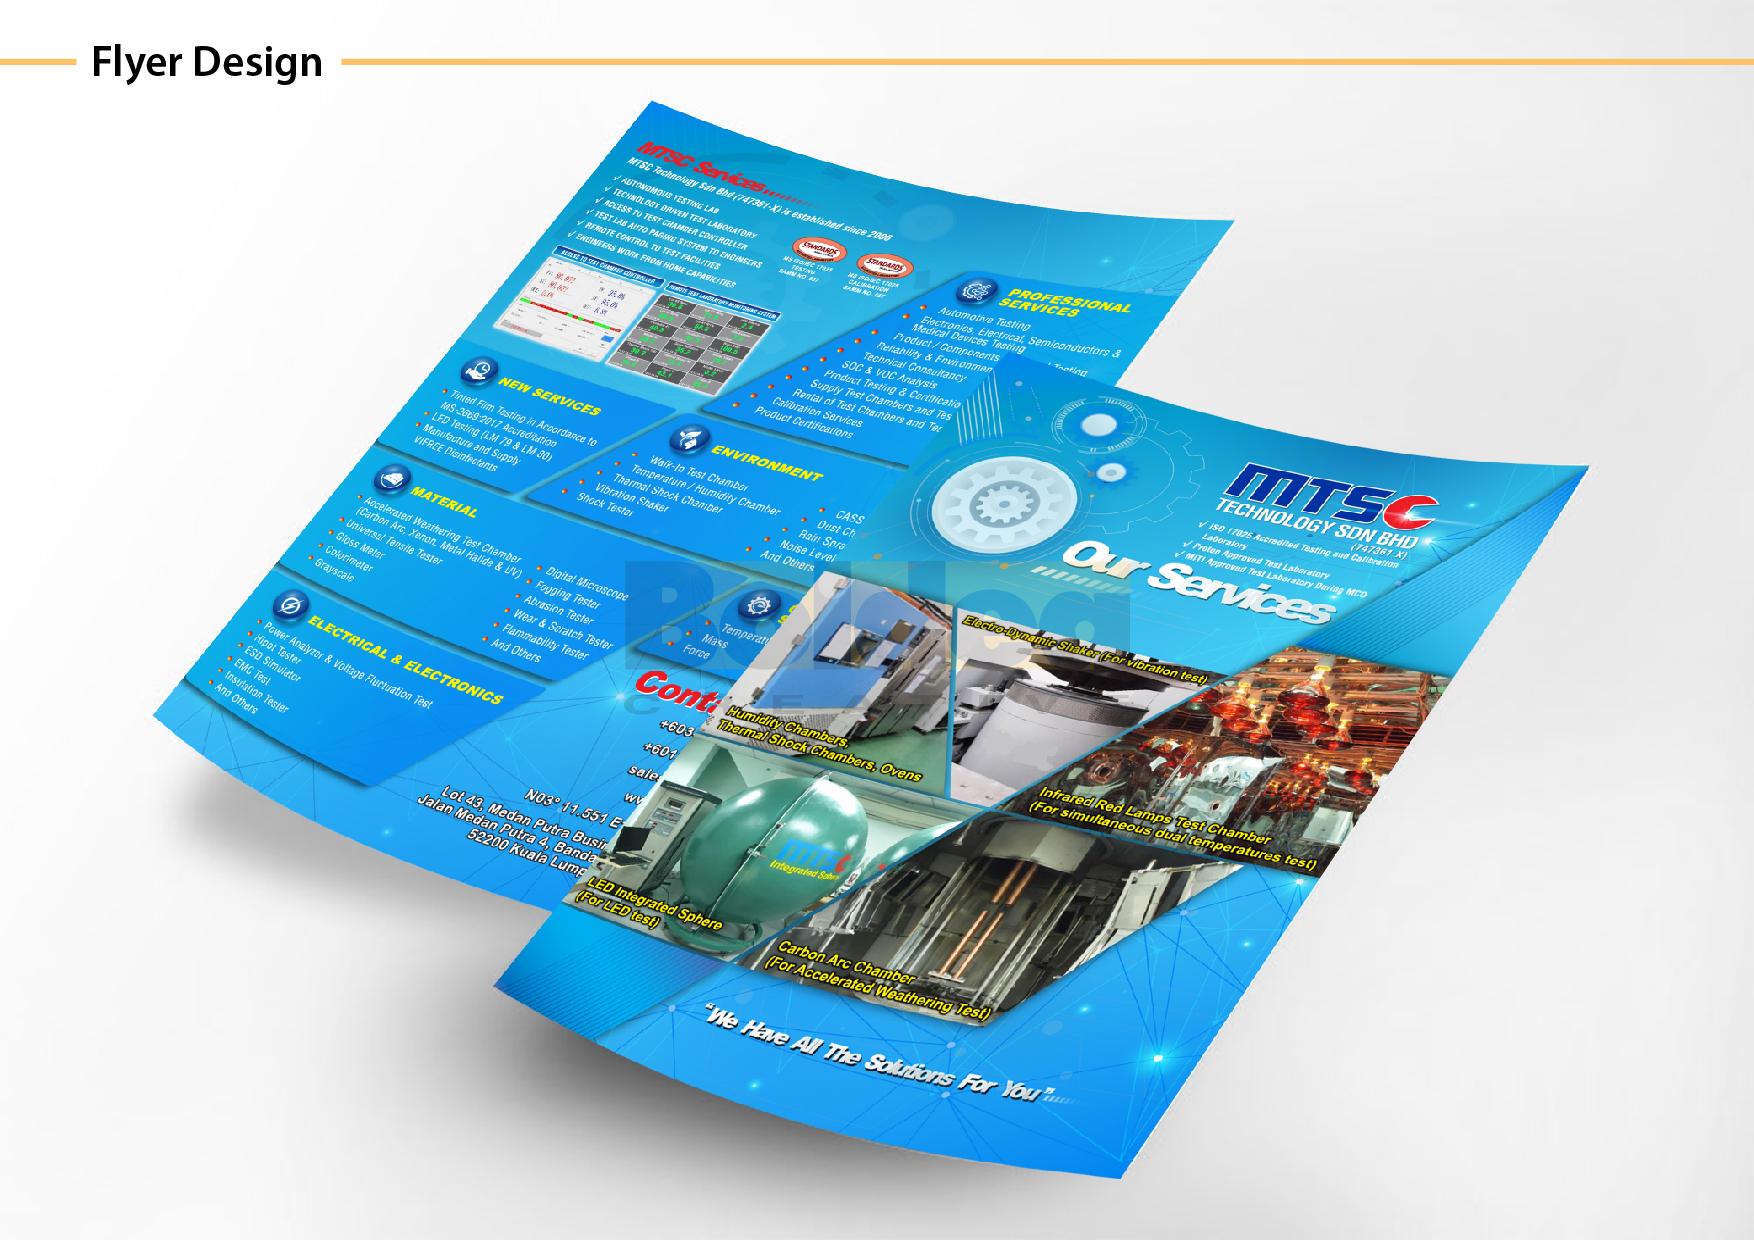 Flyer Design 2